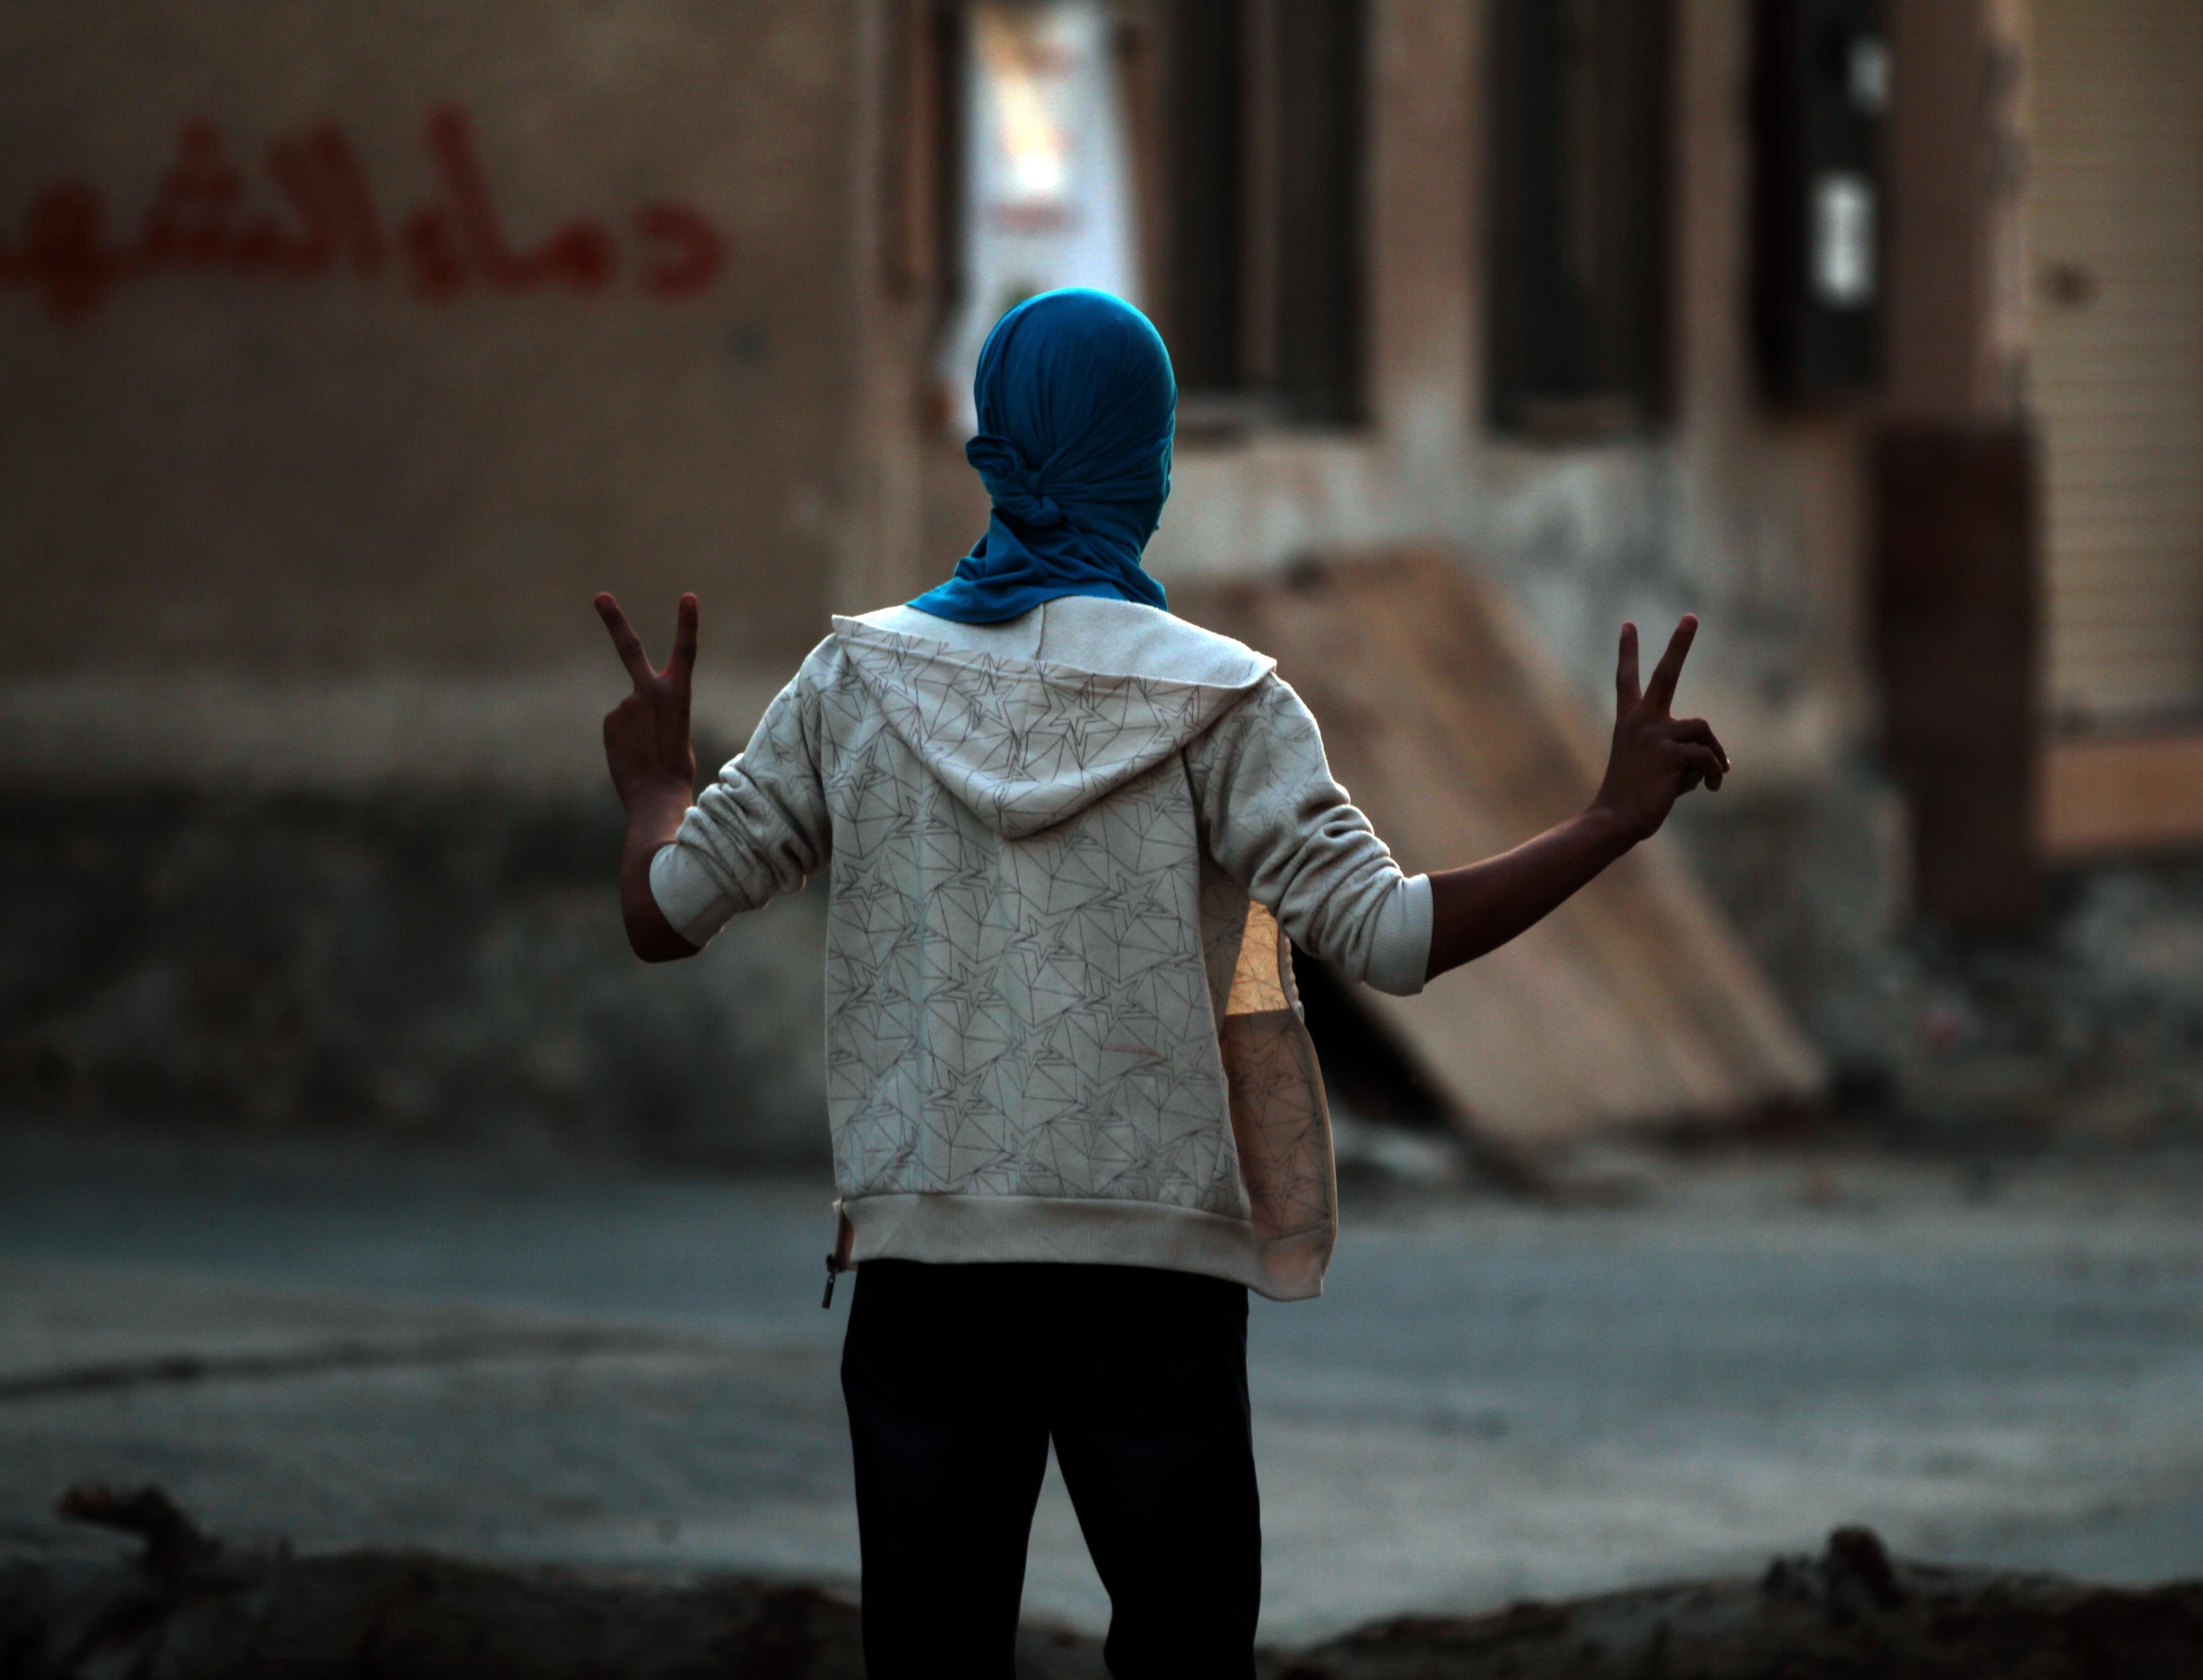 A Bahraini anti-government protester flashes the victory sign toward riot police during clashes in Abu Saiba, Bahrain, Monday, Dec. 3, 2012. (AP Photo/Hasan Jamali)